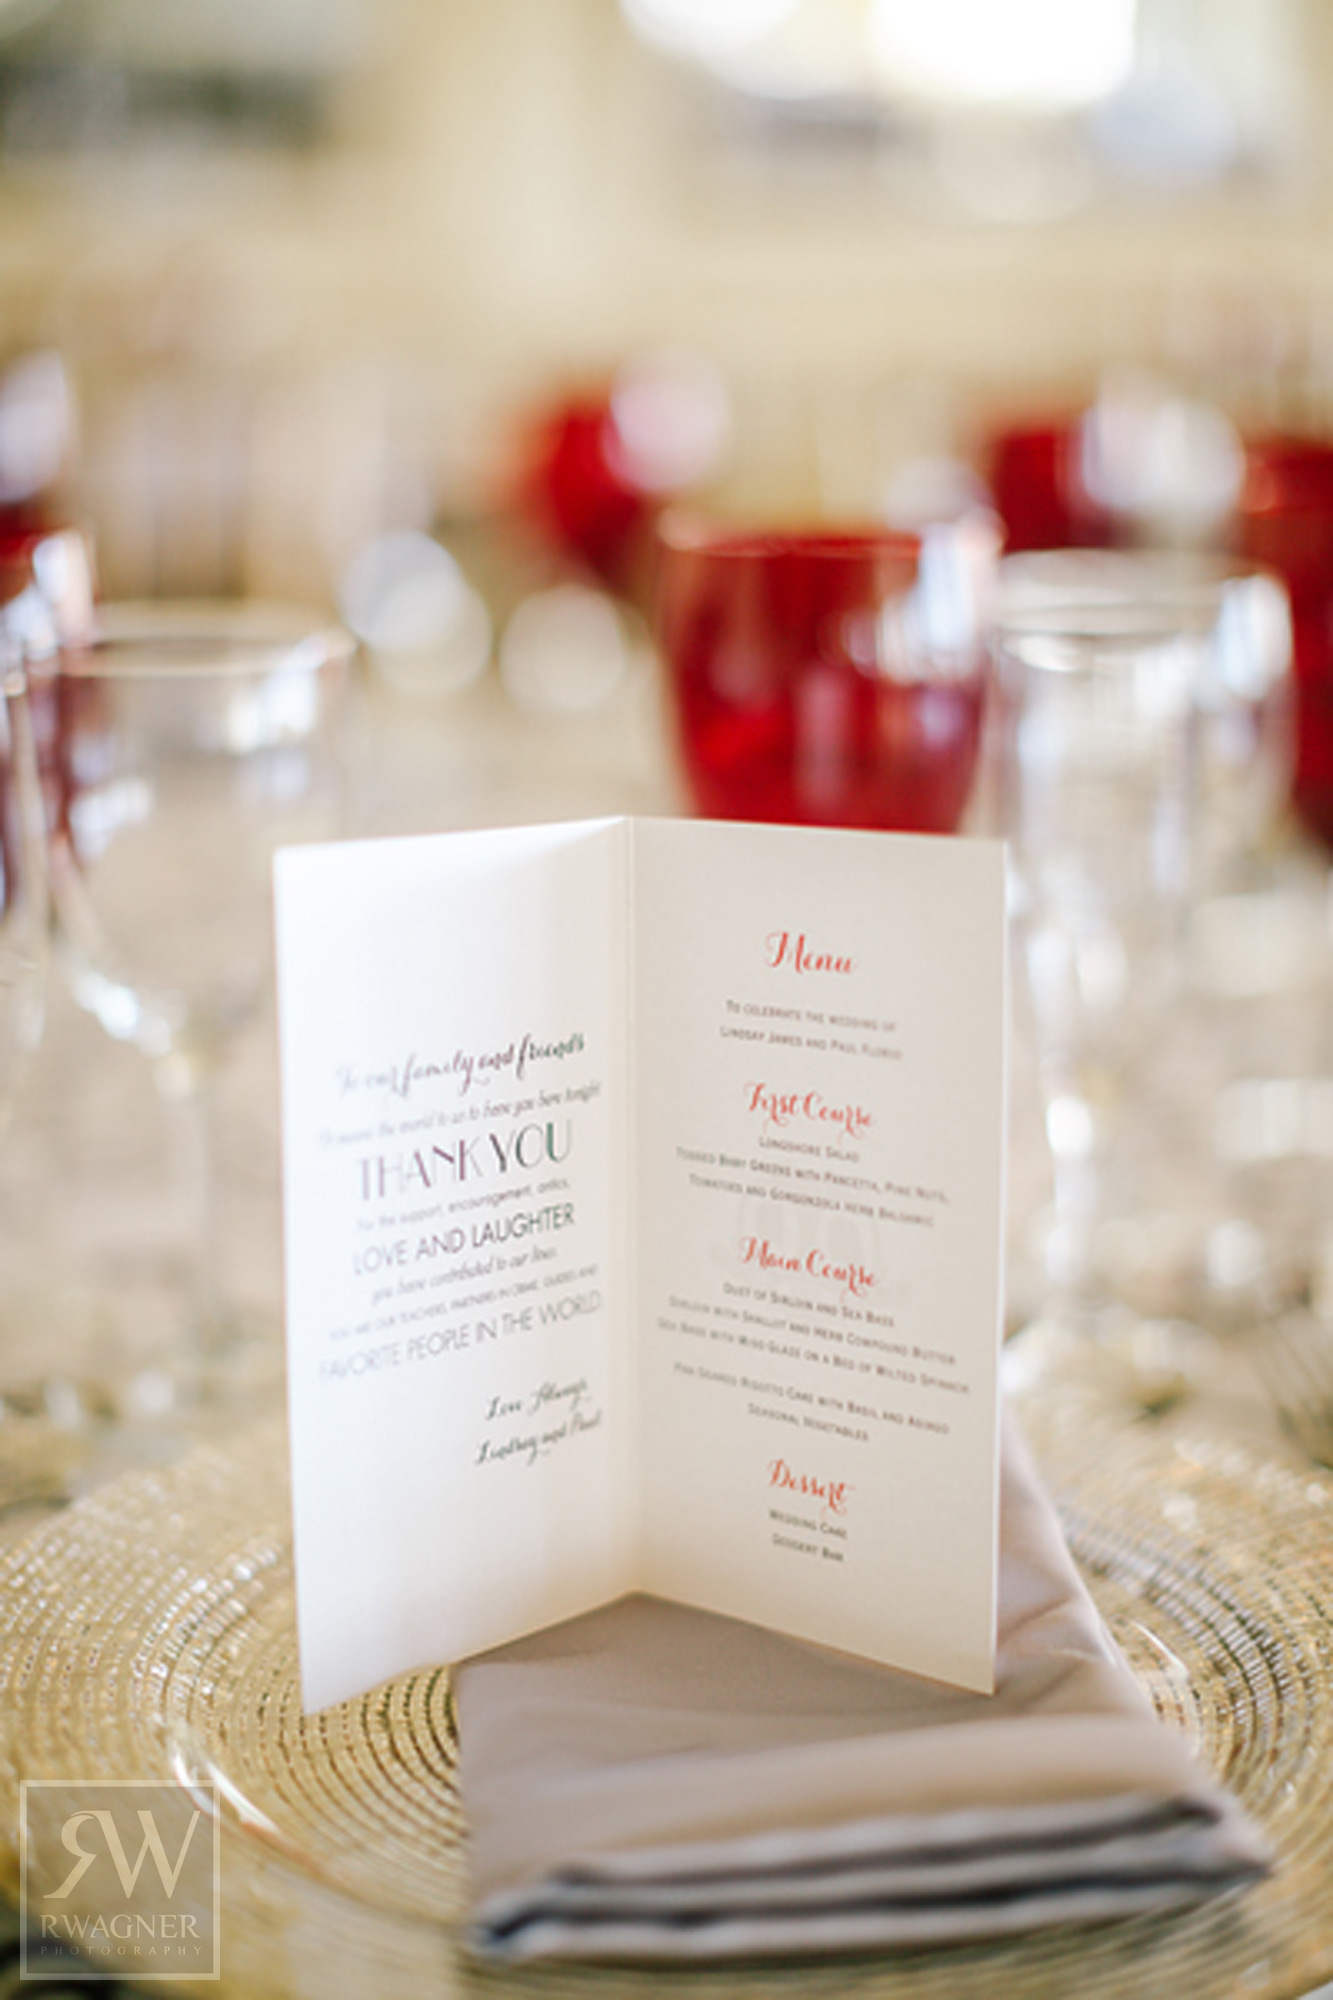 ceci_new_york_luxury_wedding_invitations_couture_red_black_white_real_wedding_dramatic_inn_at_longshore_v286_19.jpg